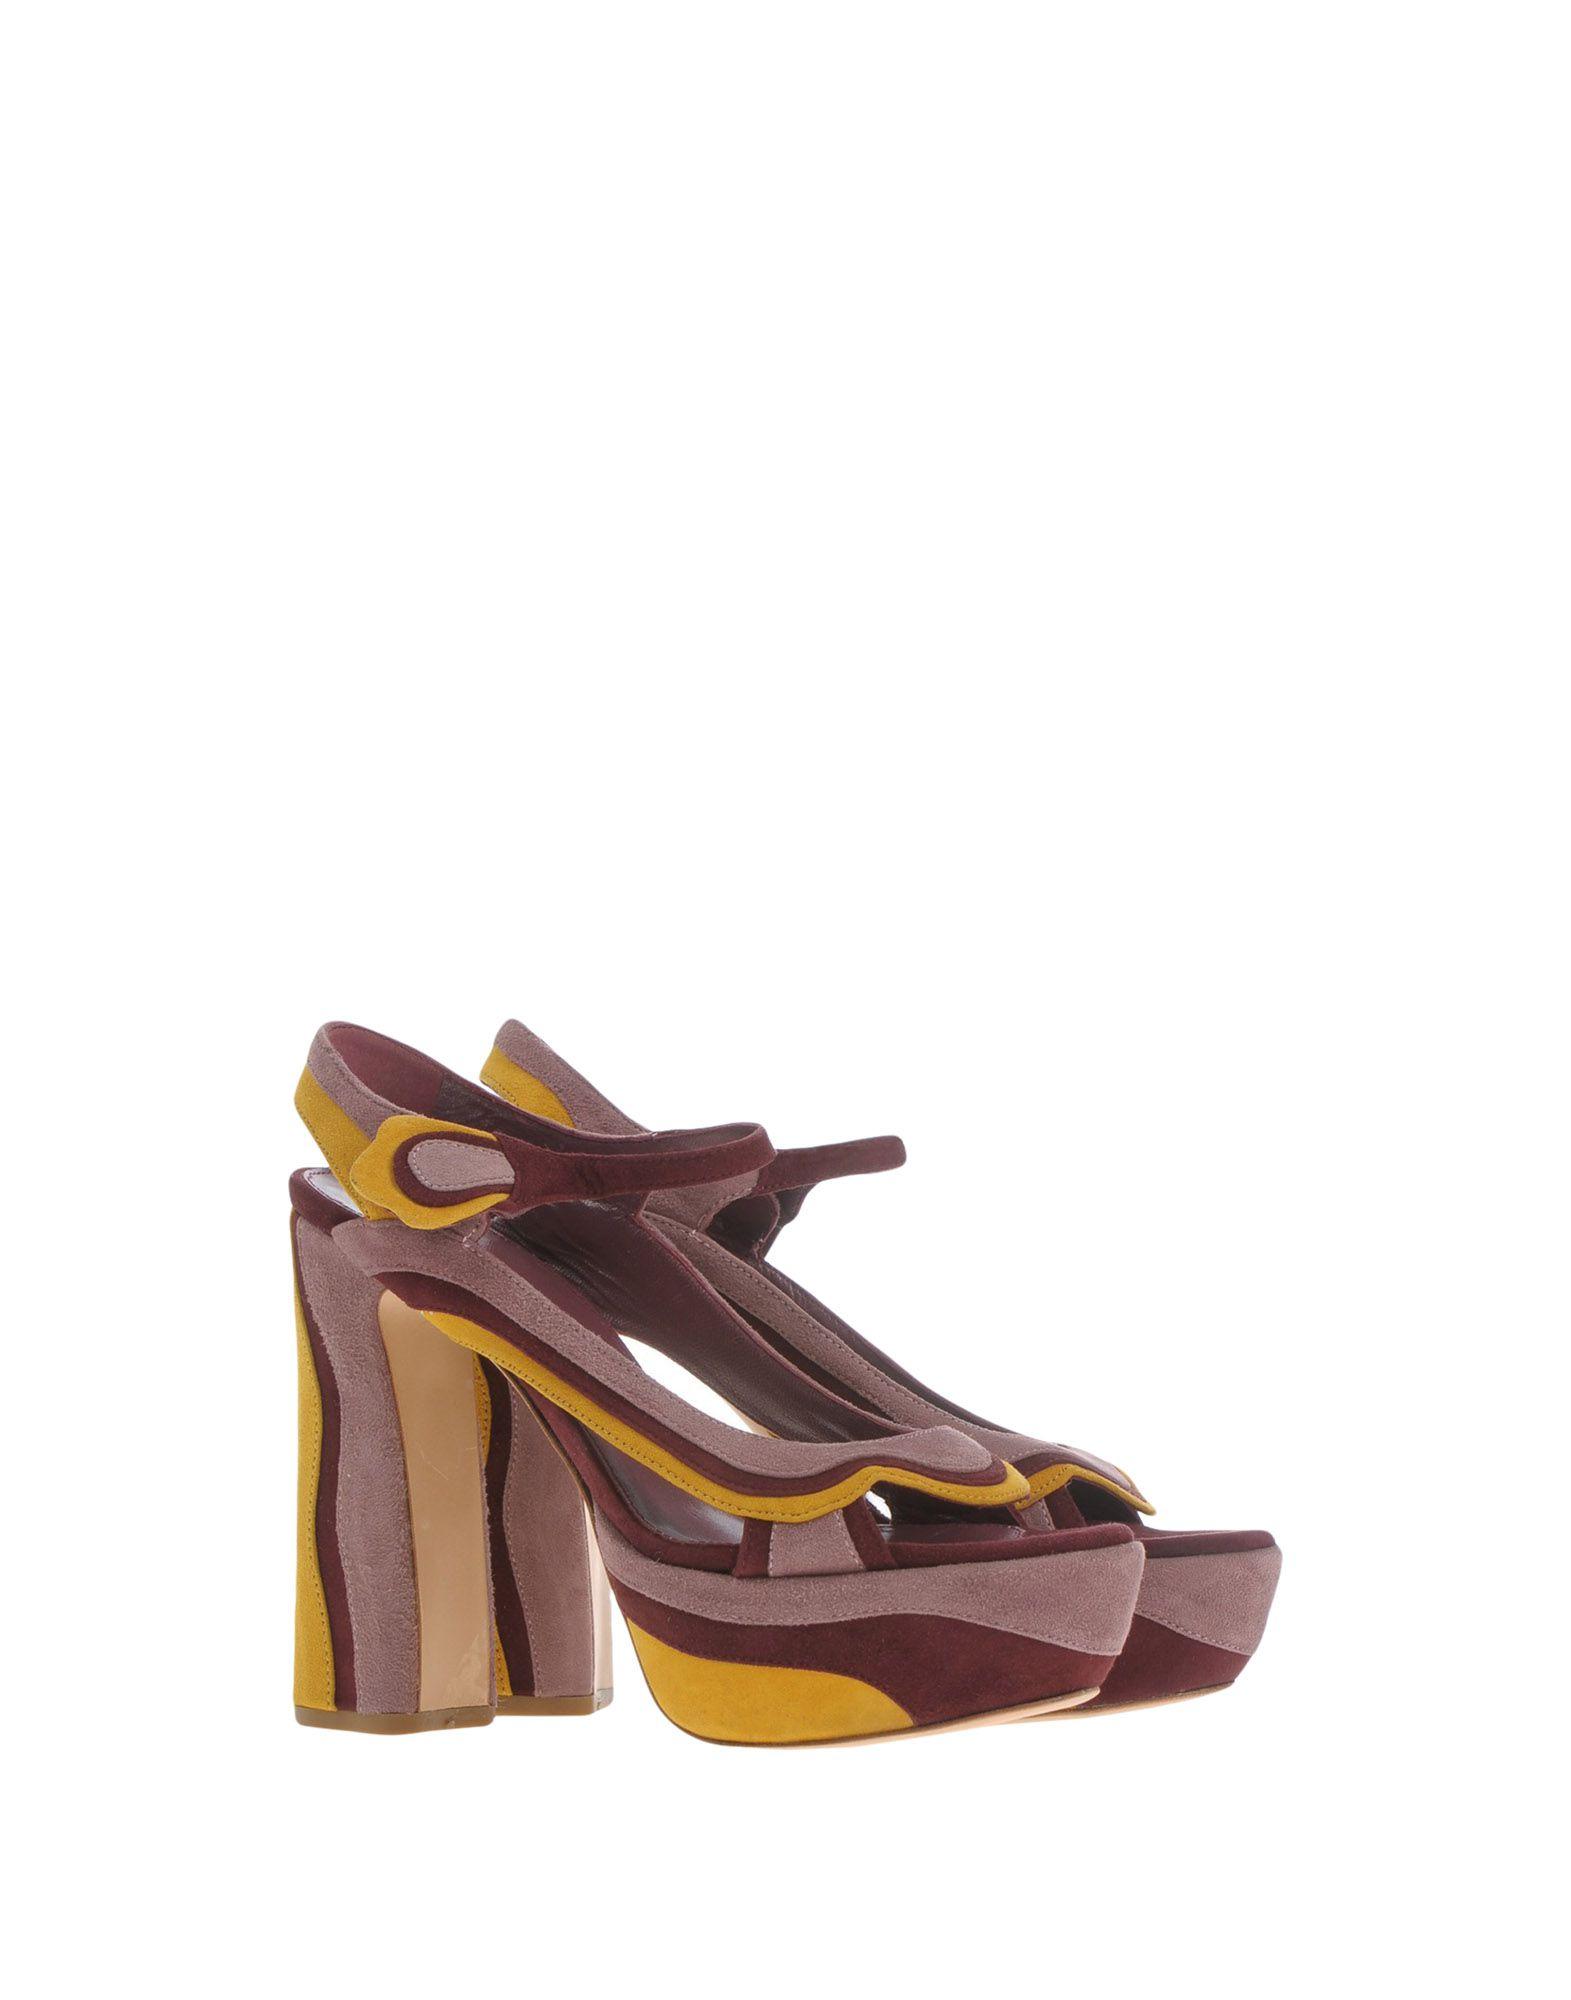 Sandales Prada Femme - Sandales Prada sur